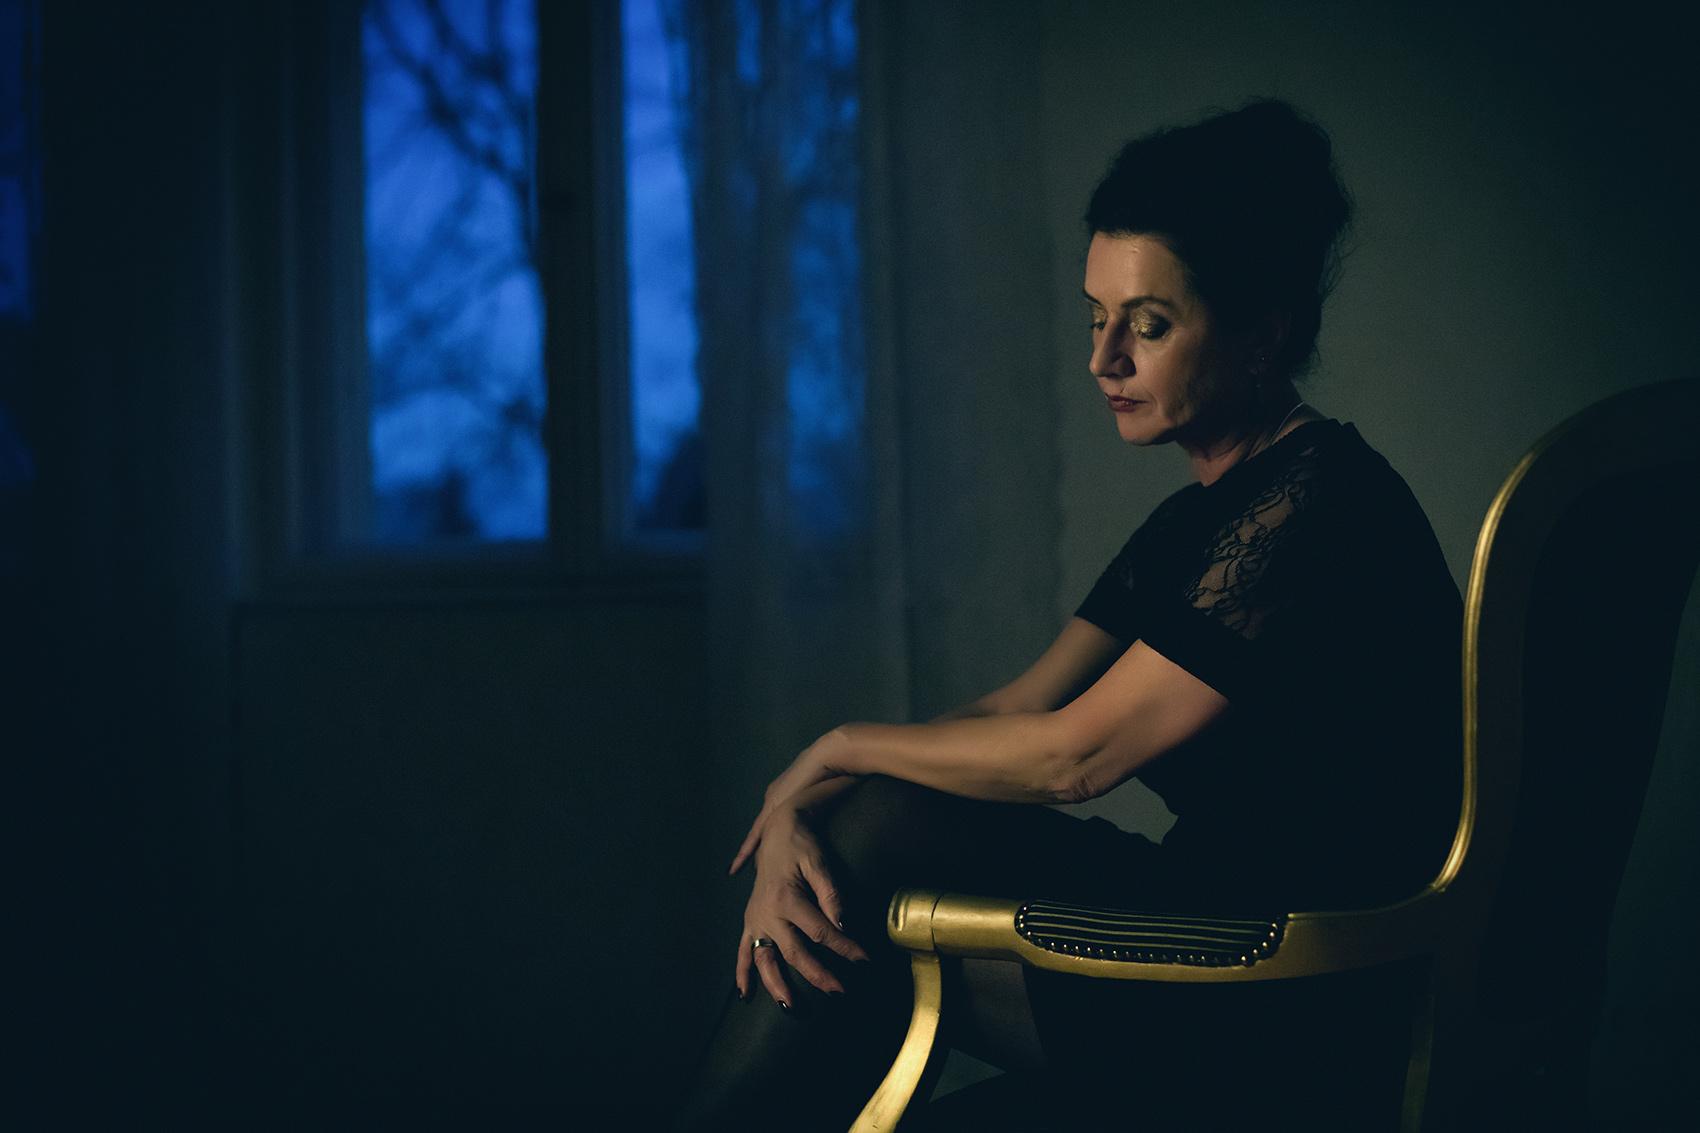 Linda-Scholz-Fotografie-Potsdam-Berlin-Brandenburg-gefühlvolle-Portraitfotografie.jpg